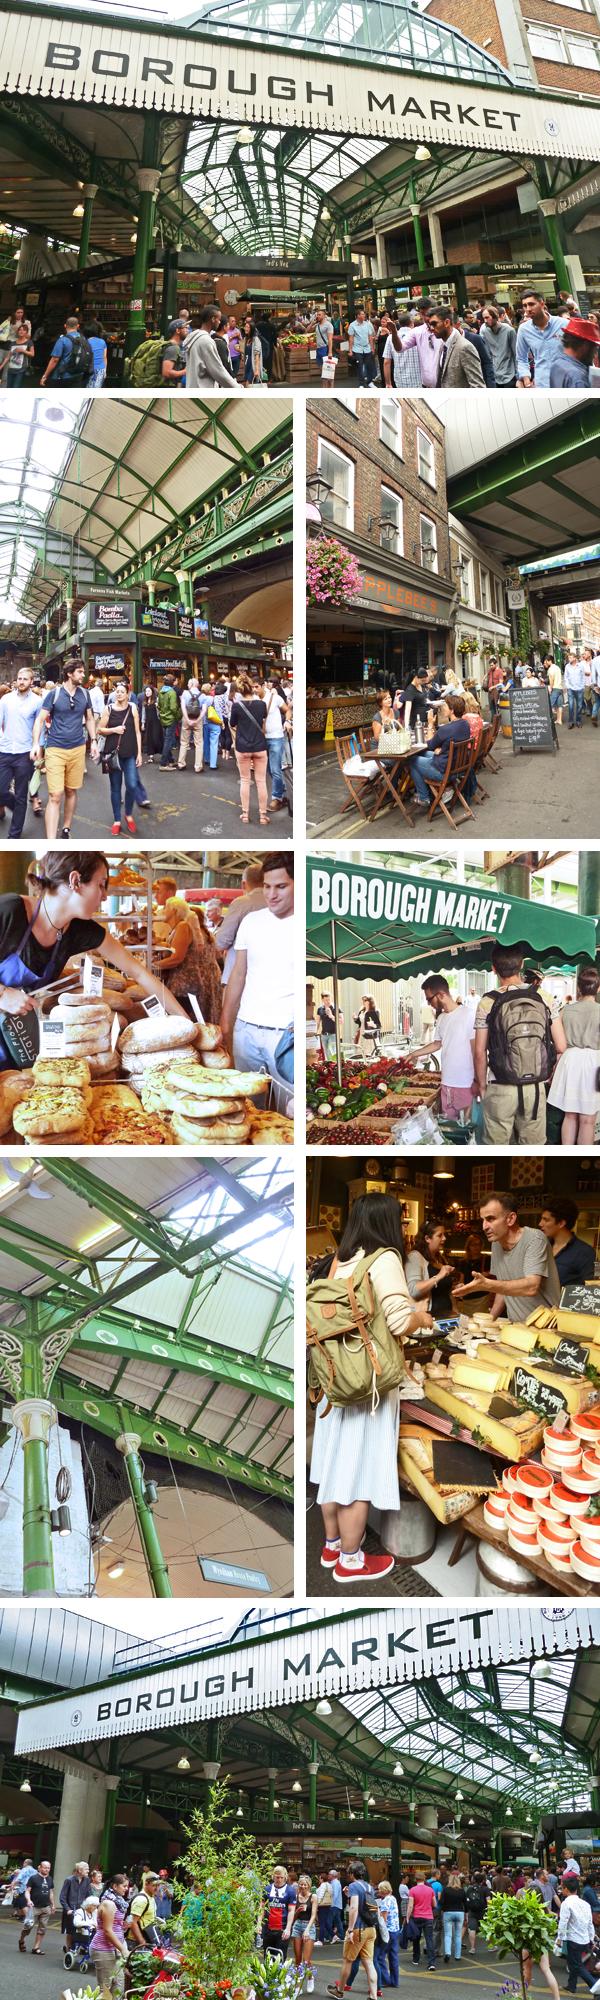 Impressionen vom Londoner Borough Market